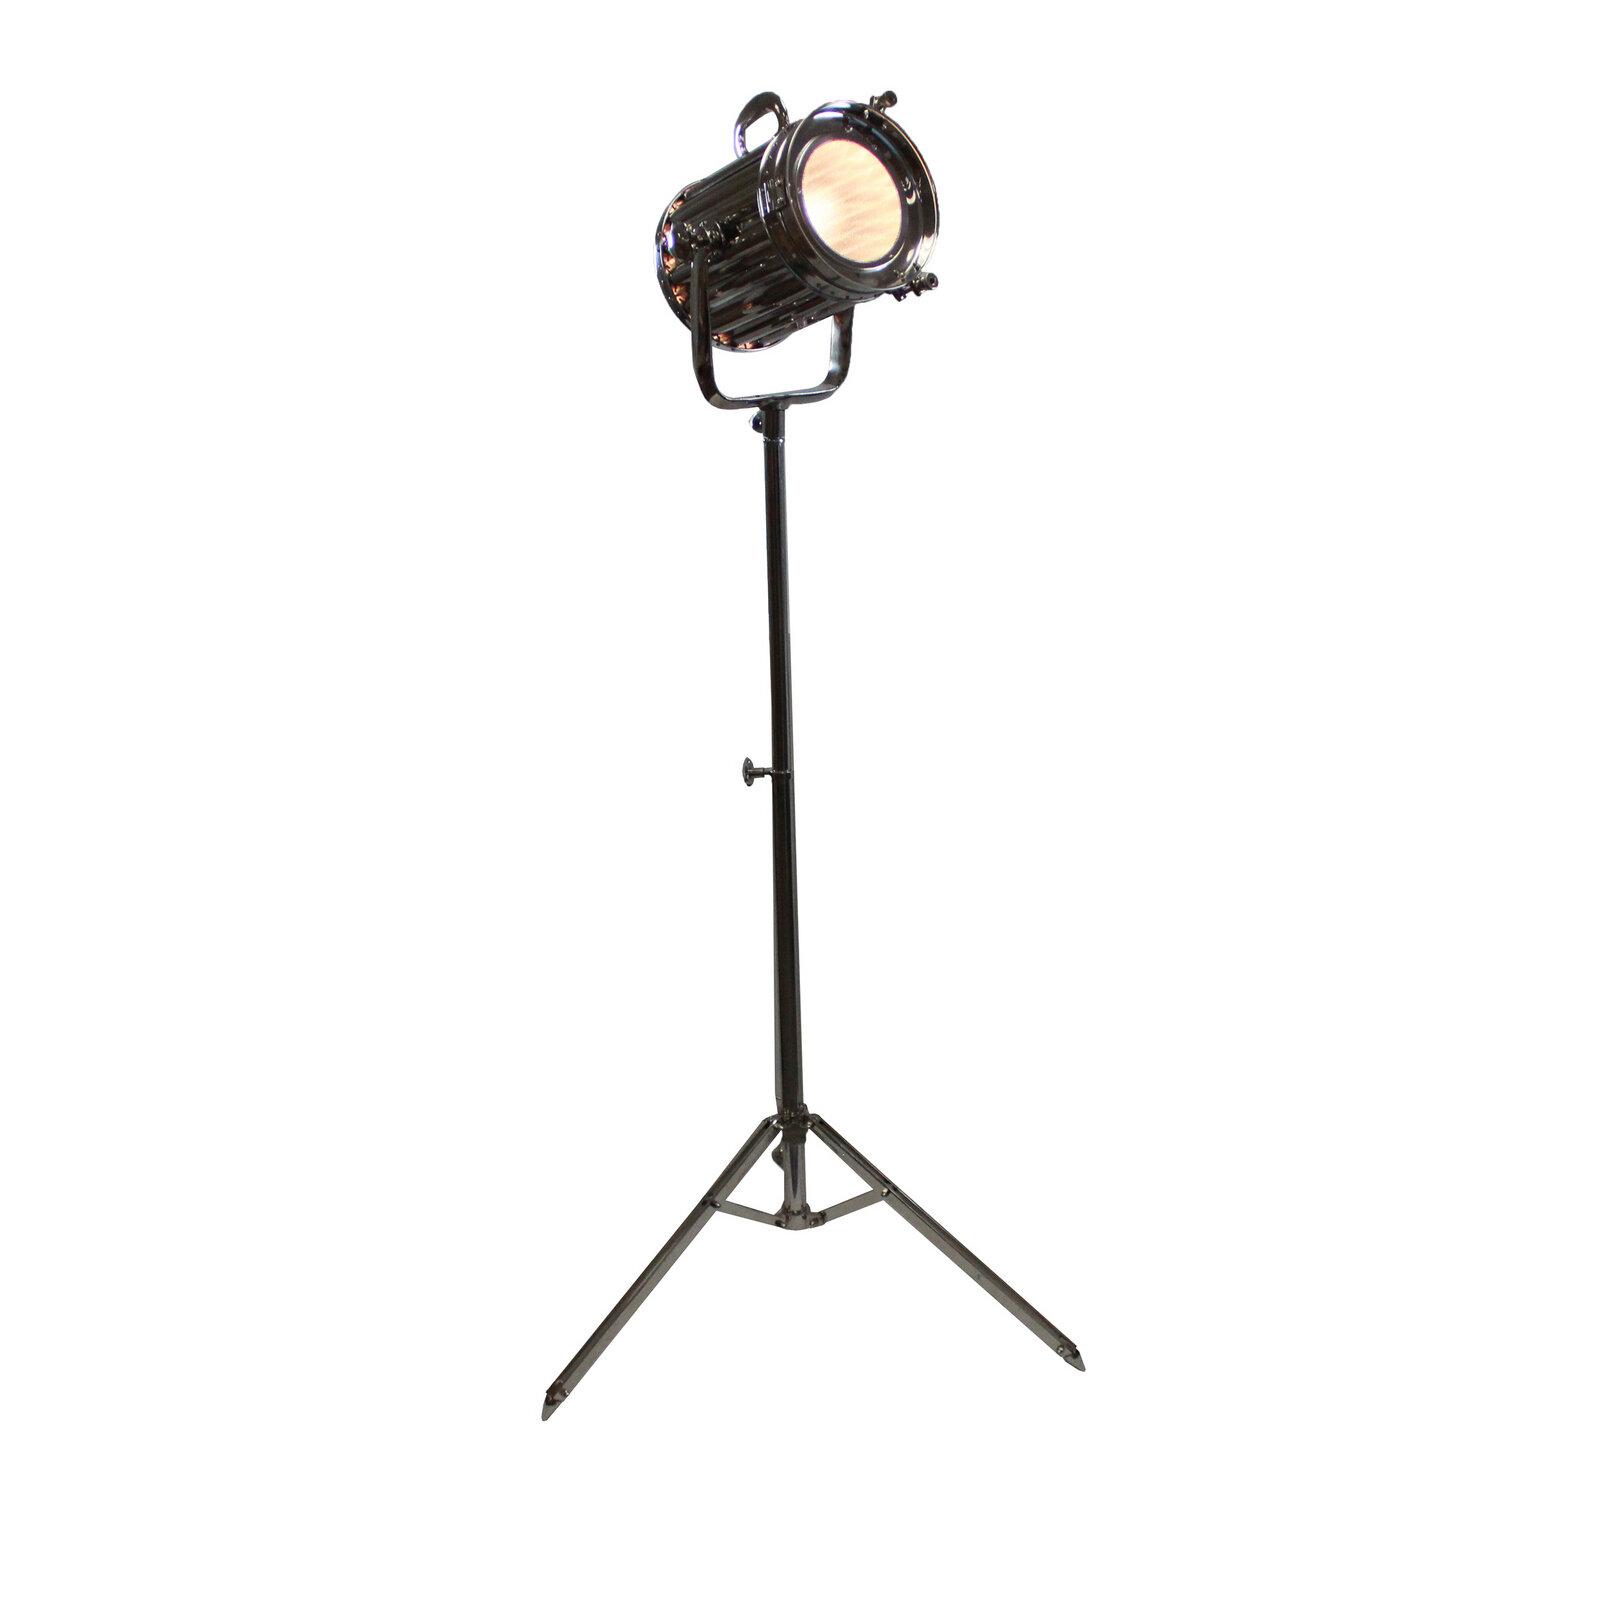 Topsfield Round Cinema Studio Spotlight 71 Tripod Floor Lamp